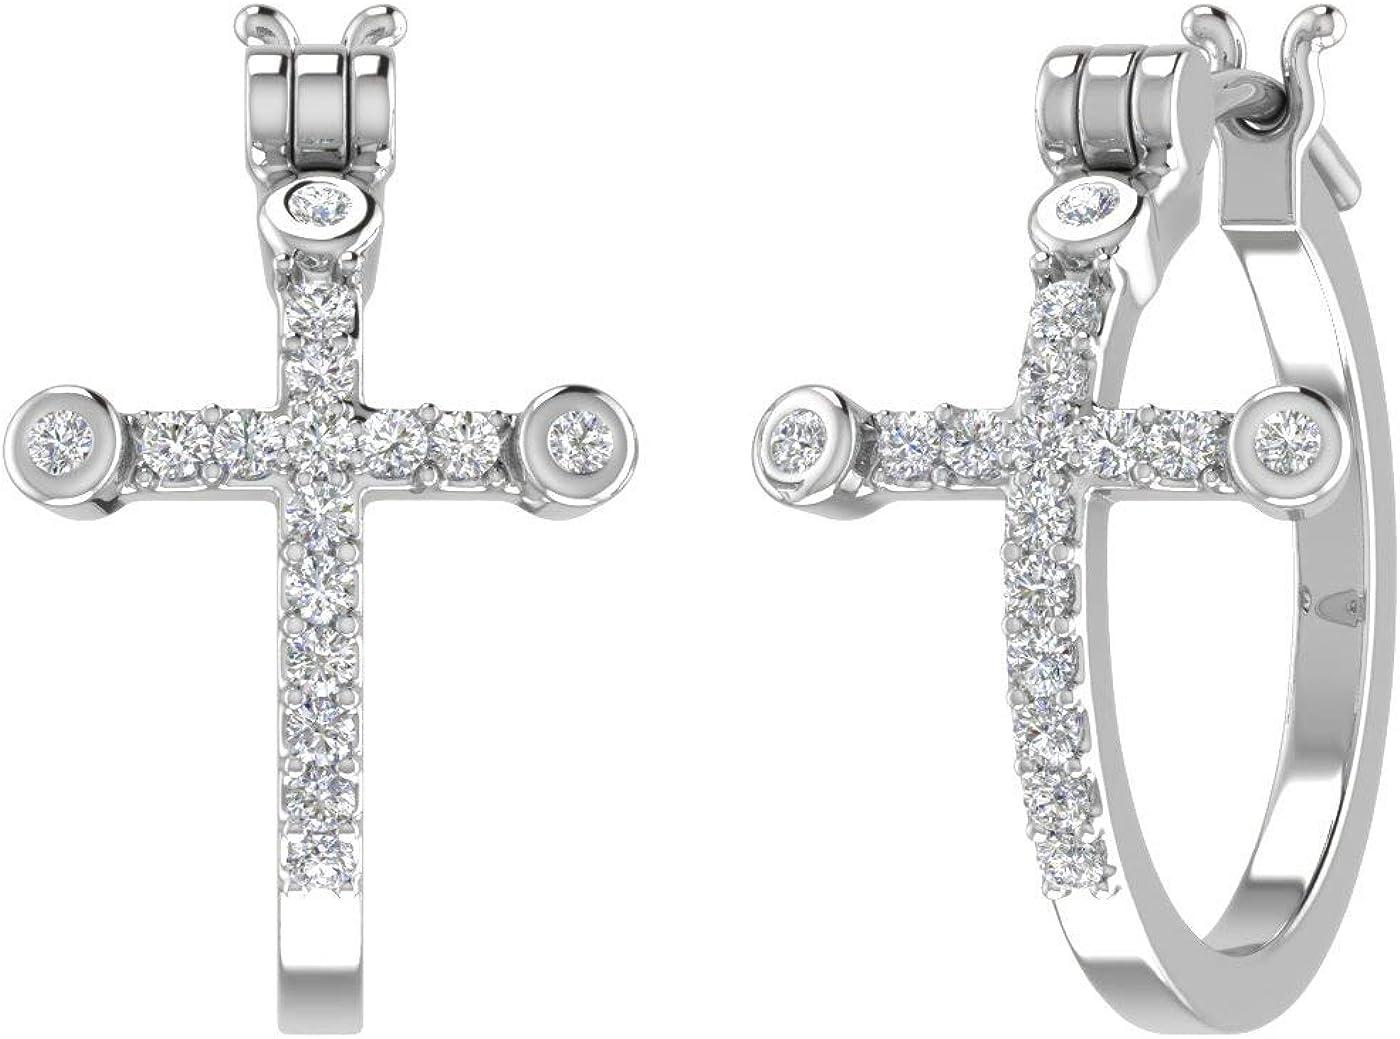 1/4 Carat Diamond Hoop Earrings with Cross Sign in 10K Gold